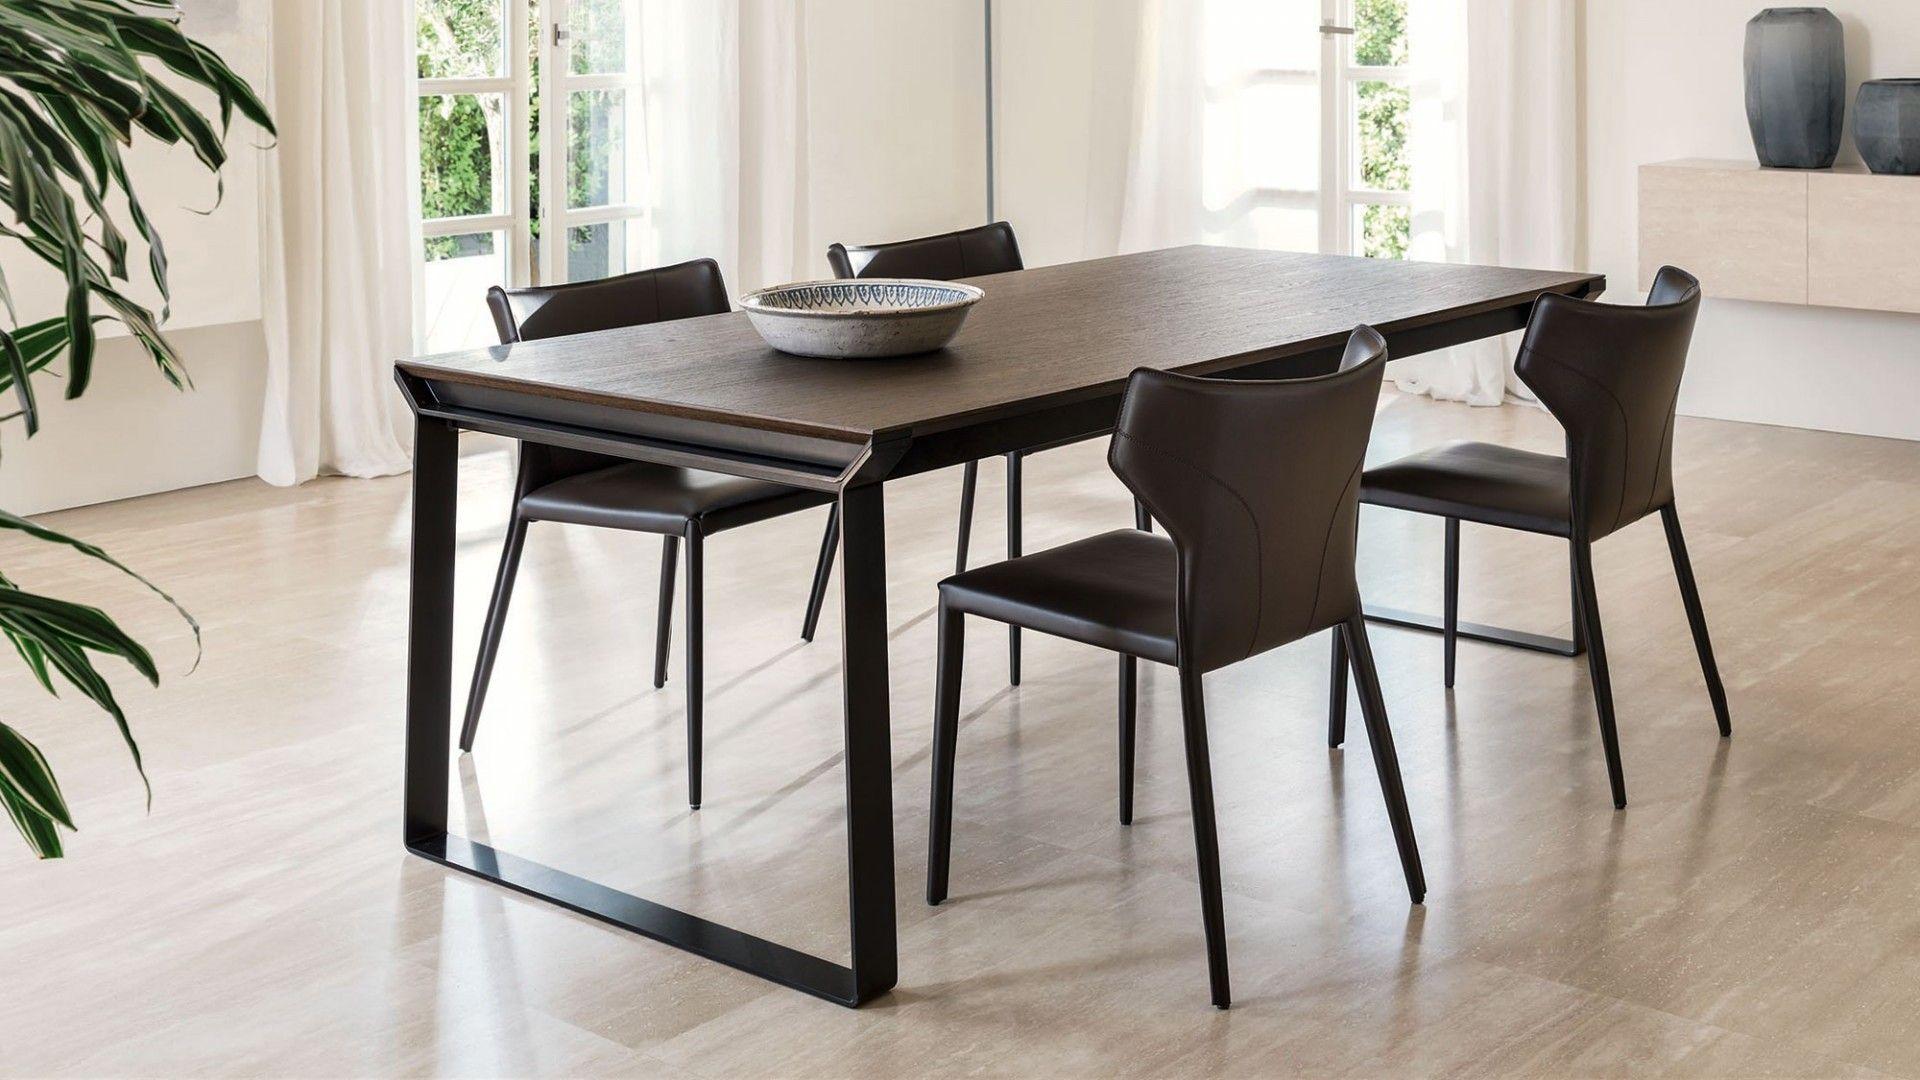 Natuzzi Italia Pigreco Chairs